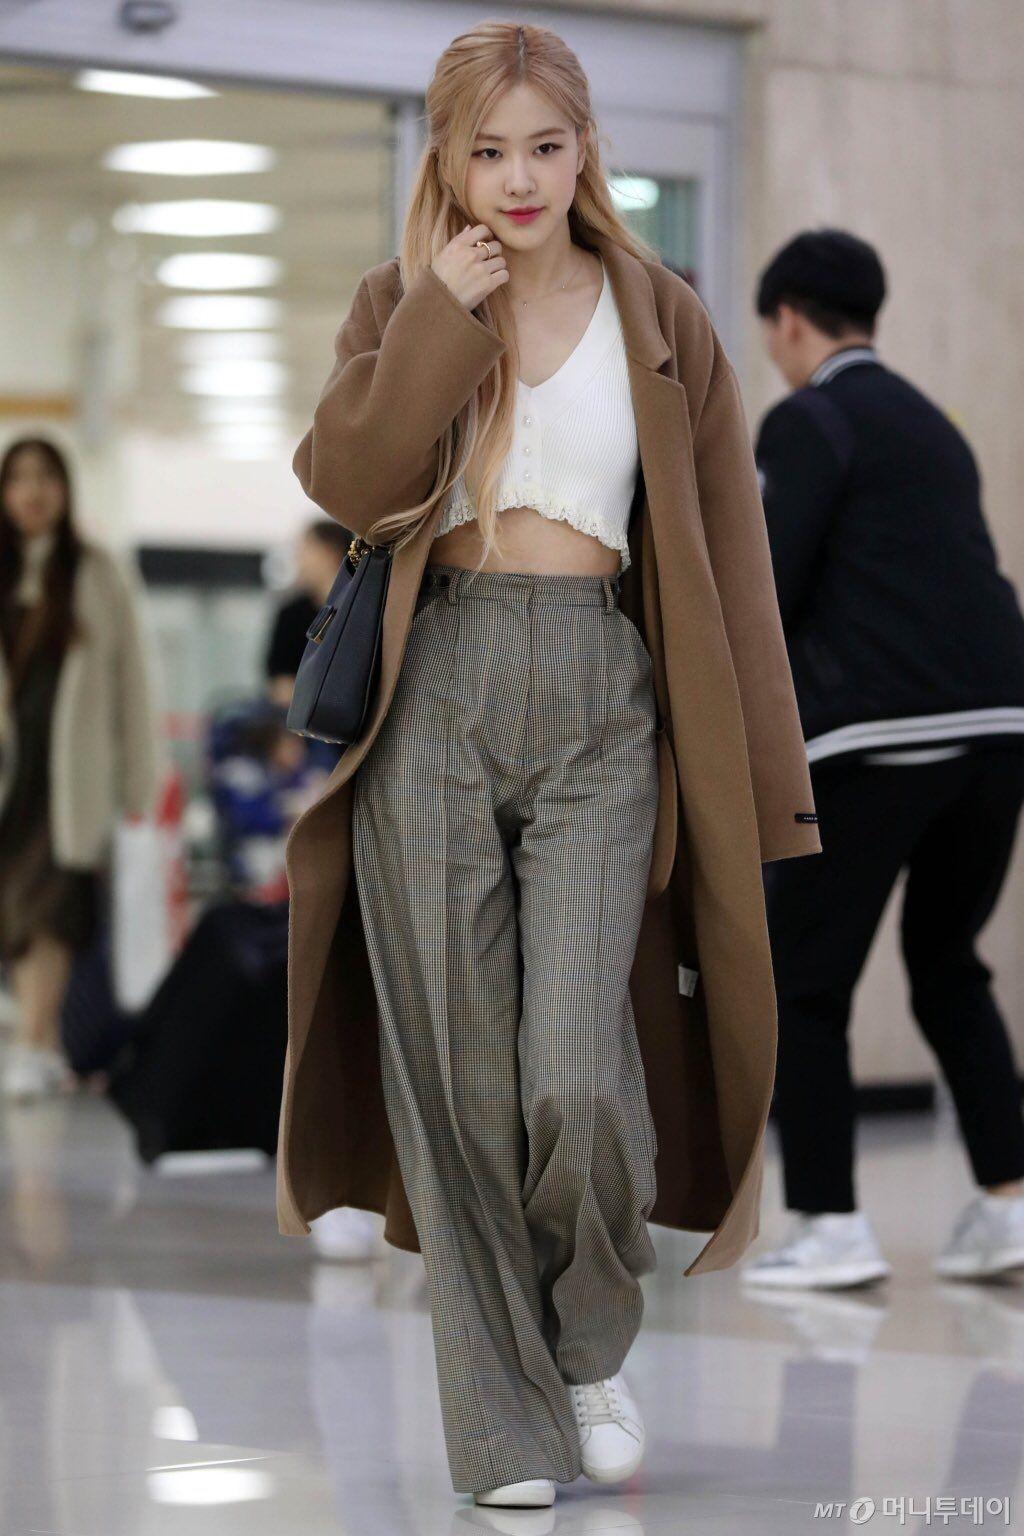 Rosenation On In 2020 Kpop Fashion Outfits Blackpink Fashion Blackpink Rose